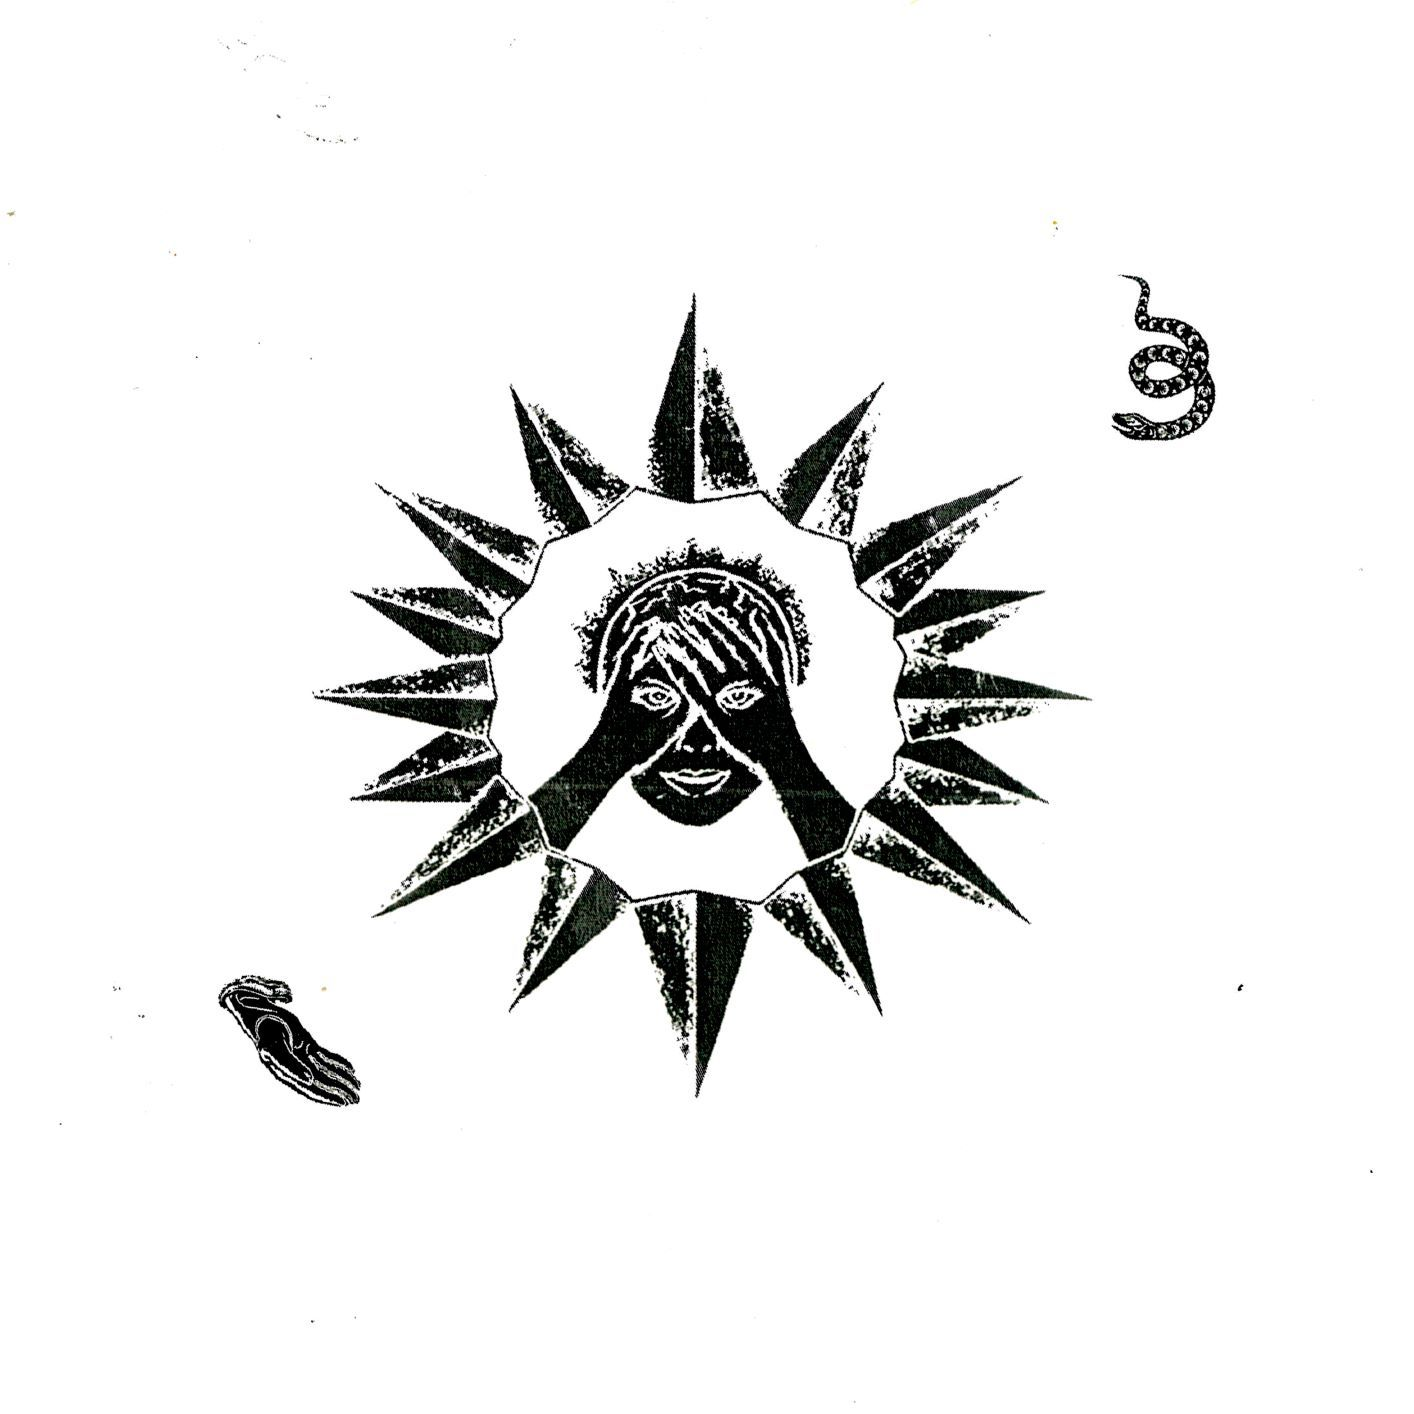 vrwrk_-_the_sun_in_my_shadow-_small.jpg